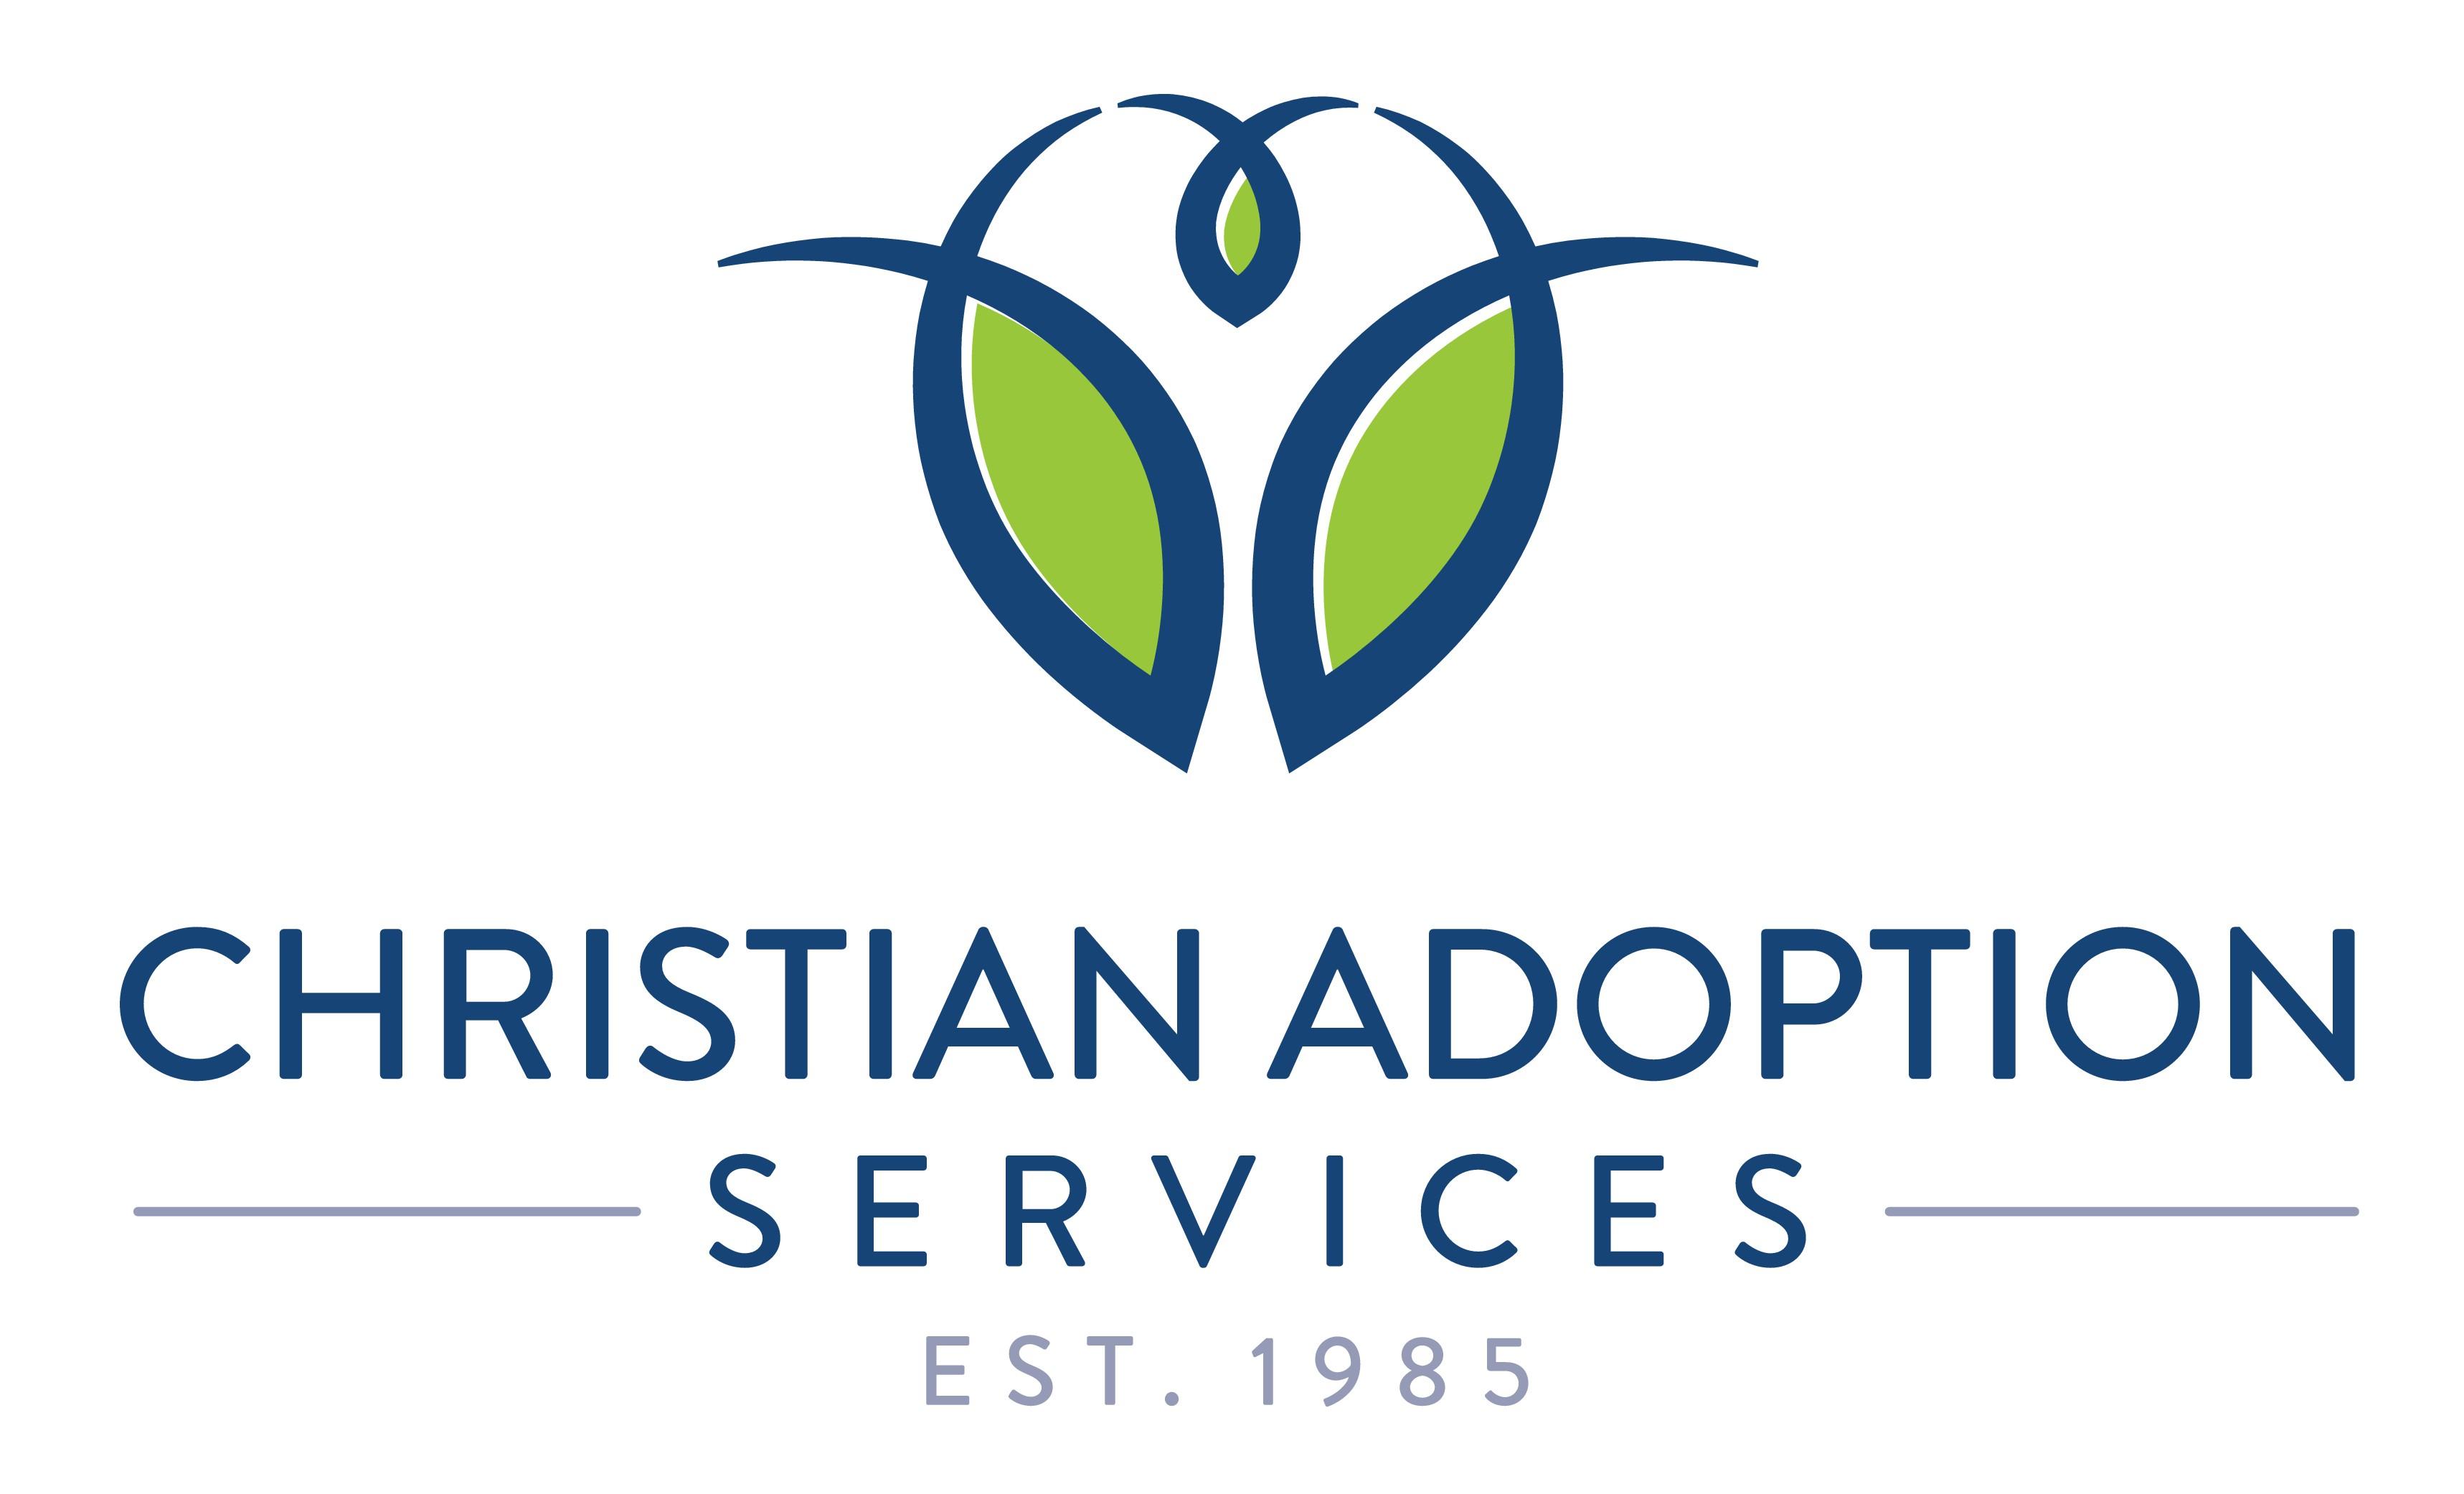 Faith-based Adoption Agency new logo with family home or family tree imagery